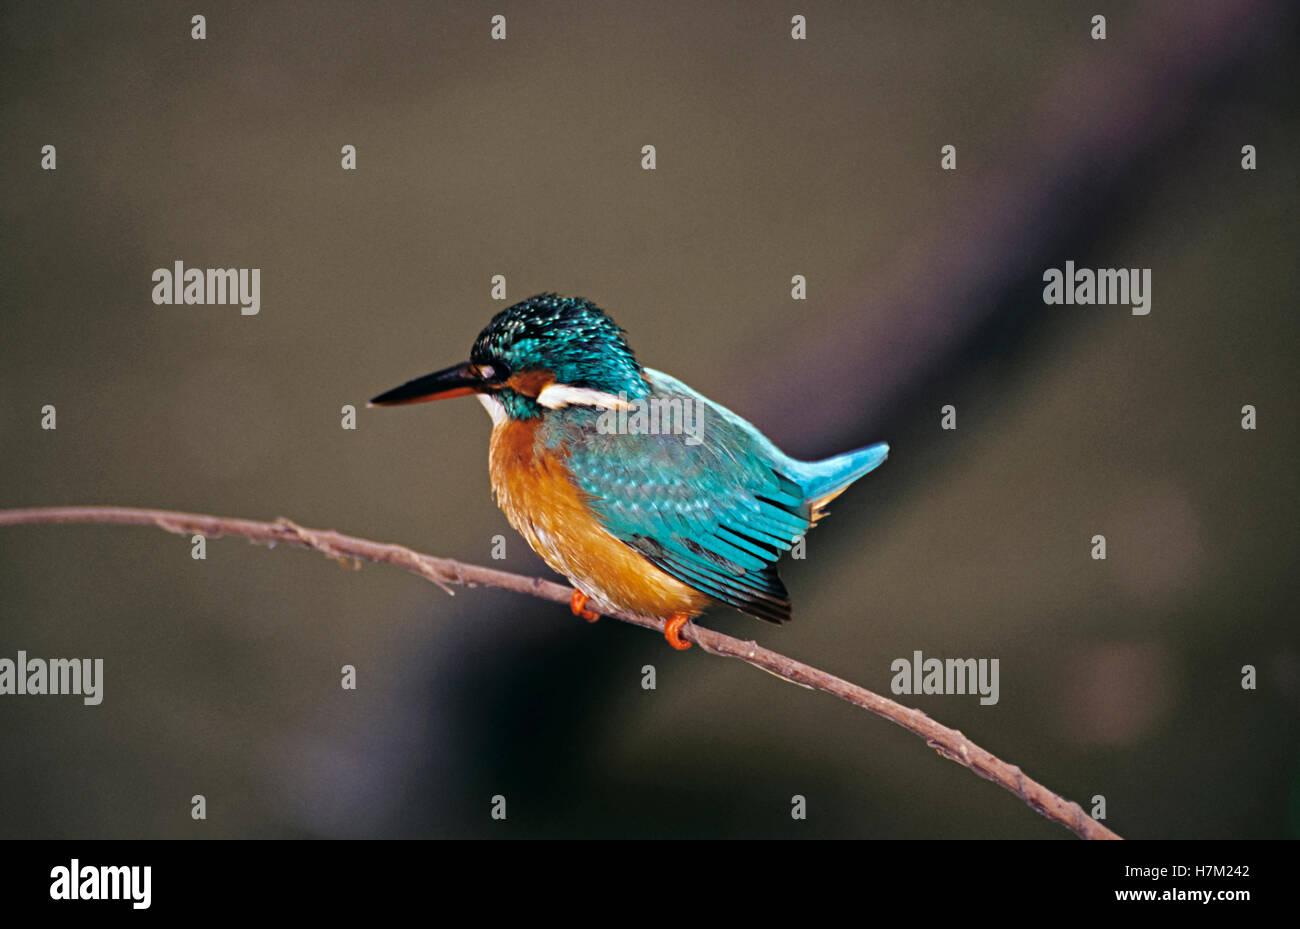 Common Kingfisher, Alcedo atthis, at Keoladev National Park, Bharatpur, Rajasthan, India. - Stock Image